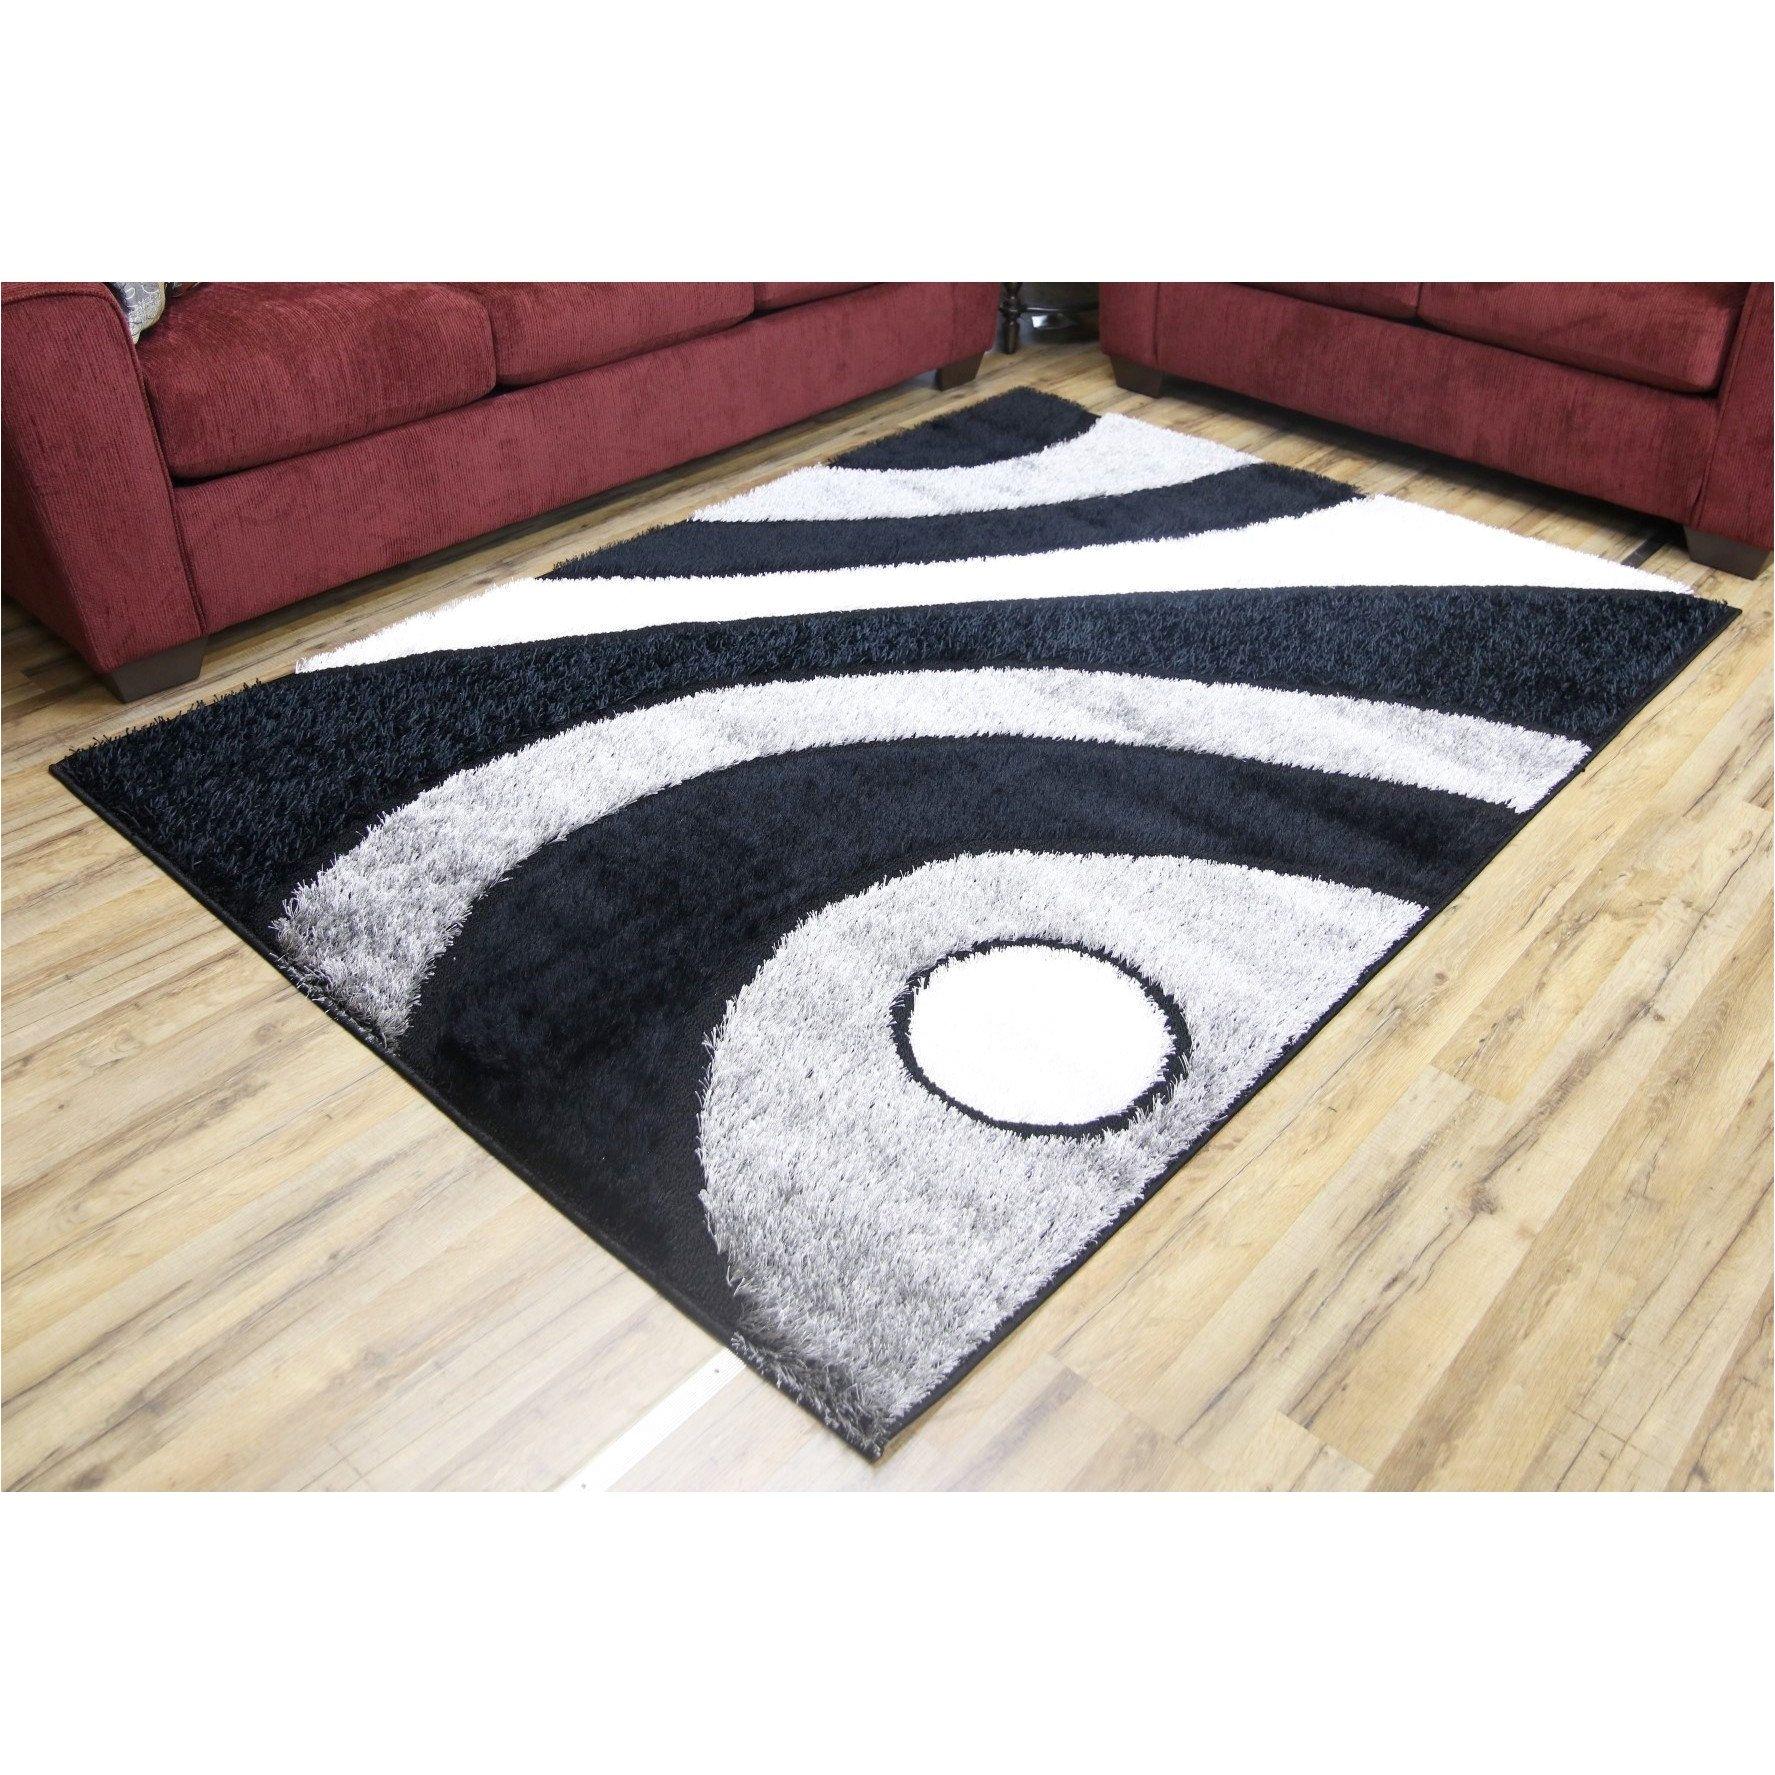 7x9 10x14 rugs for less white shag